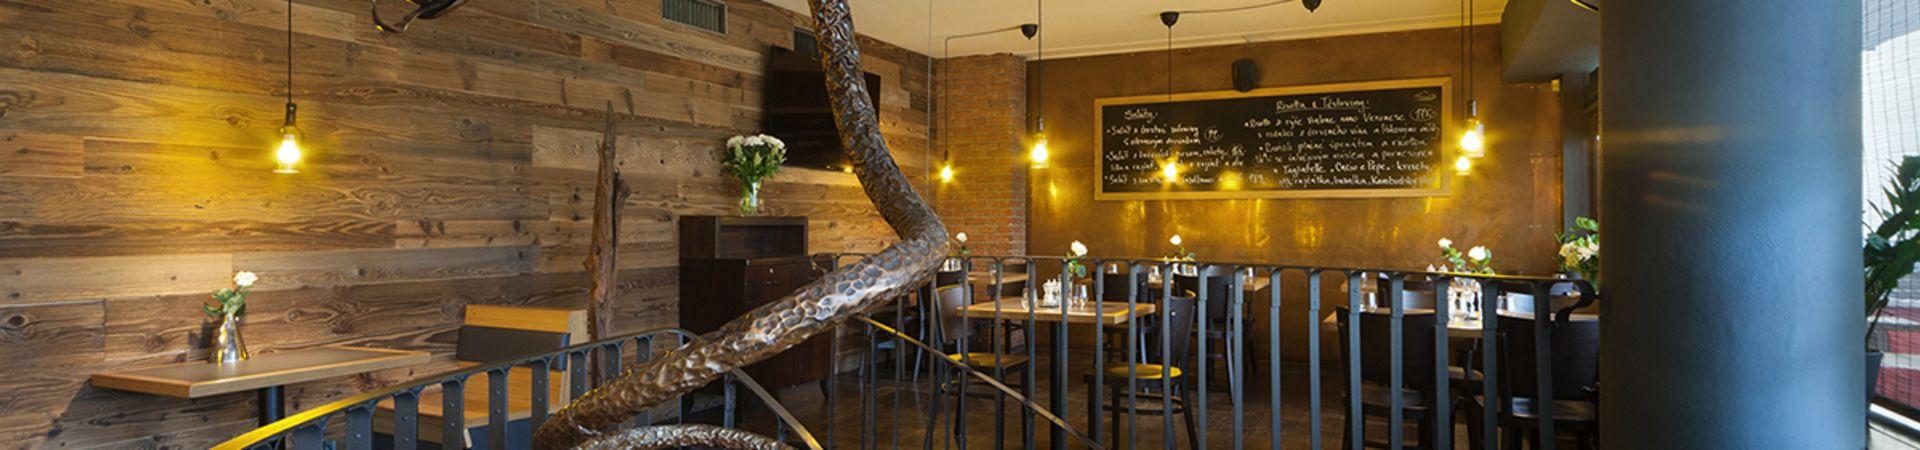 Infinity Restaurant & Music Bar